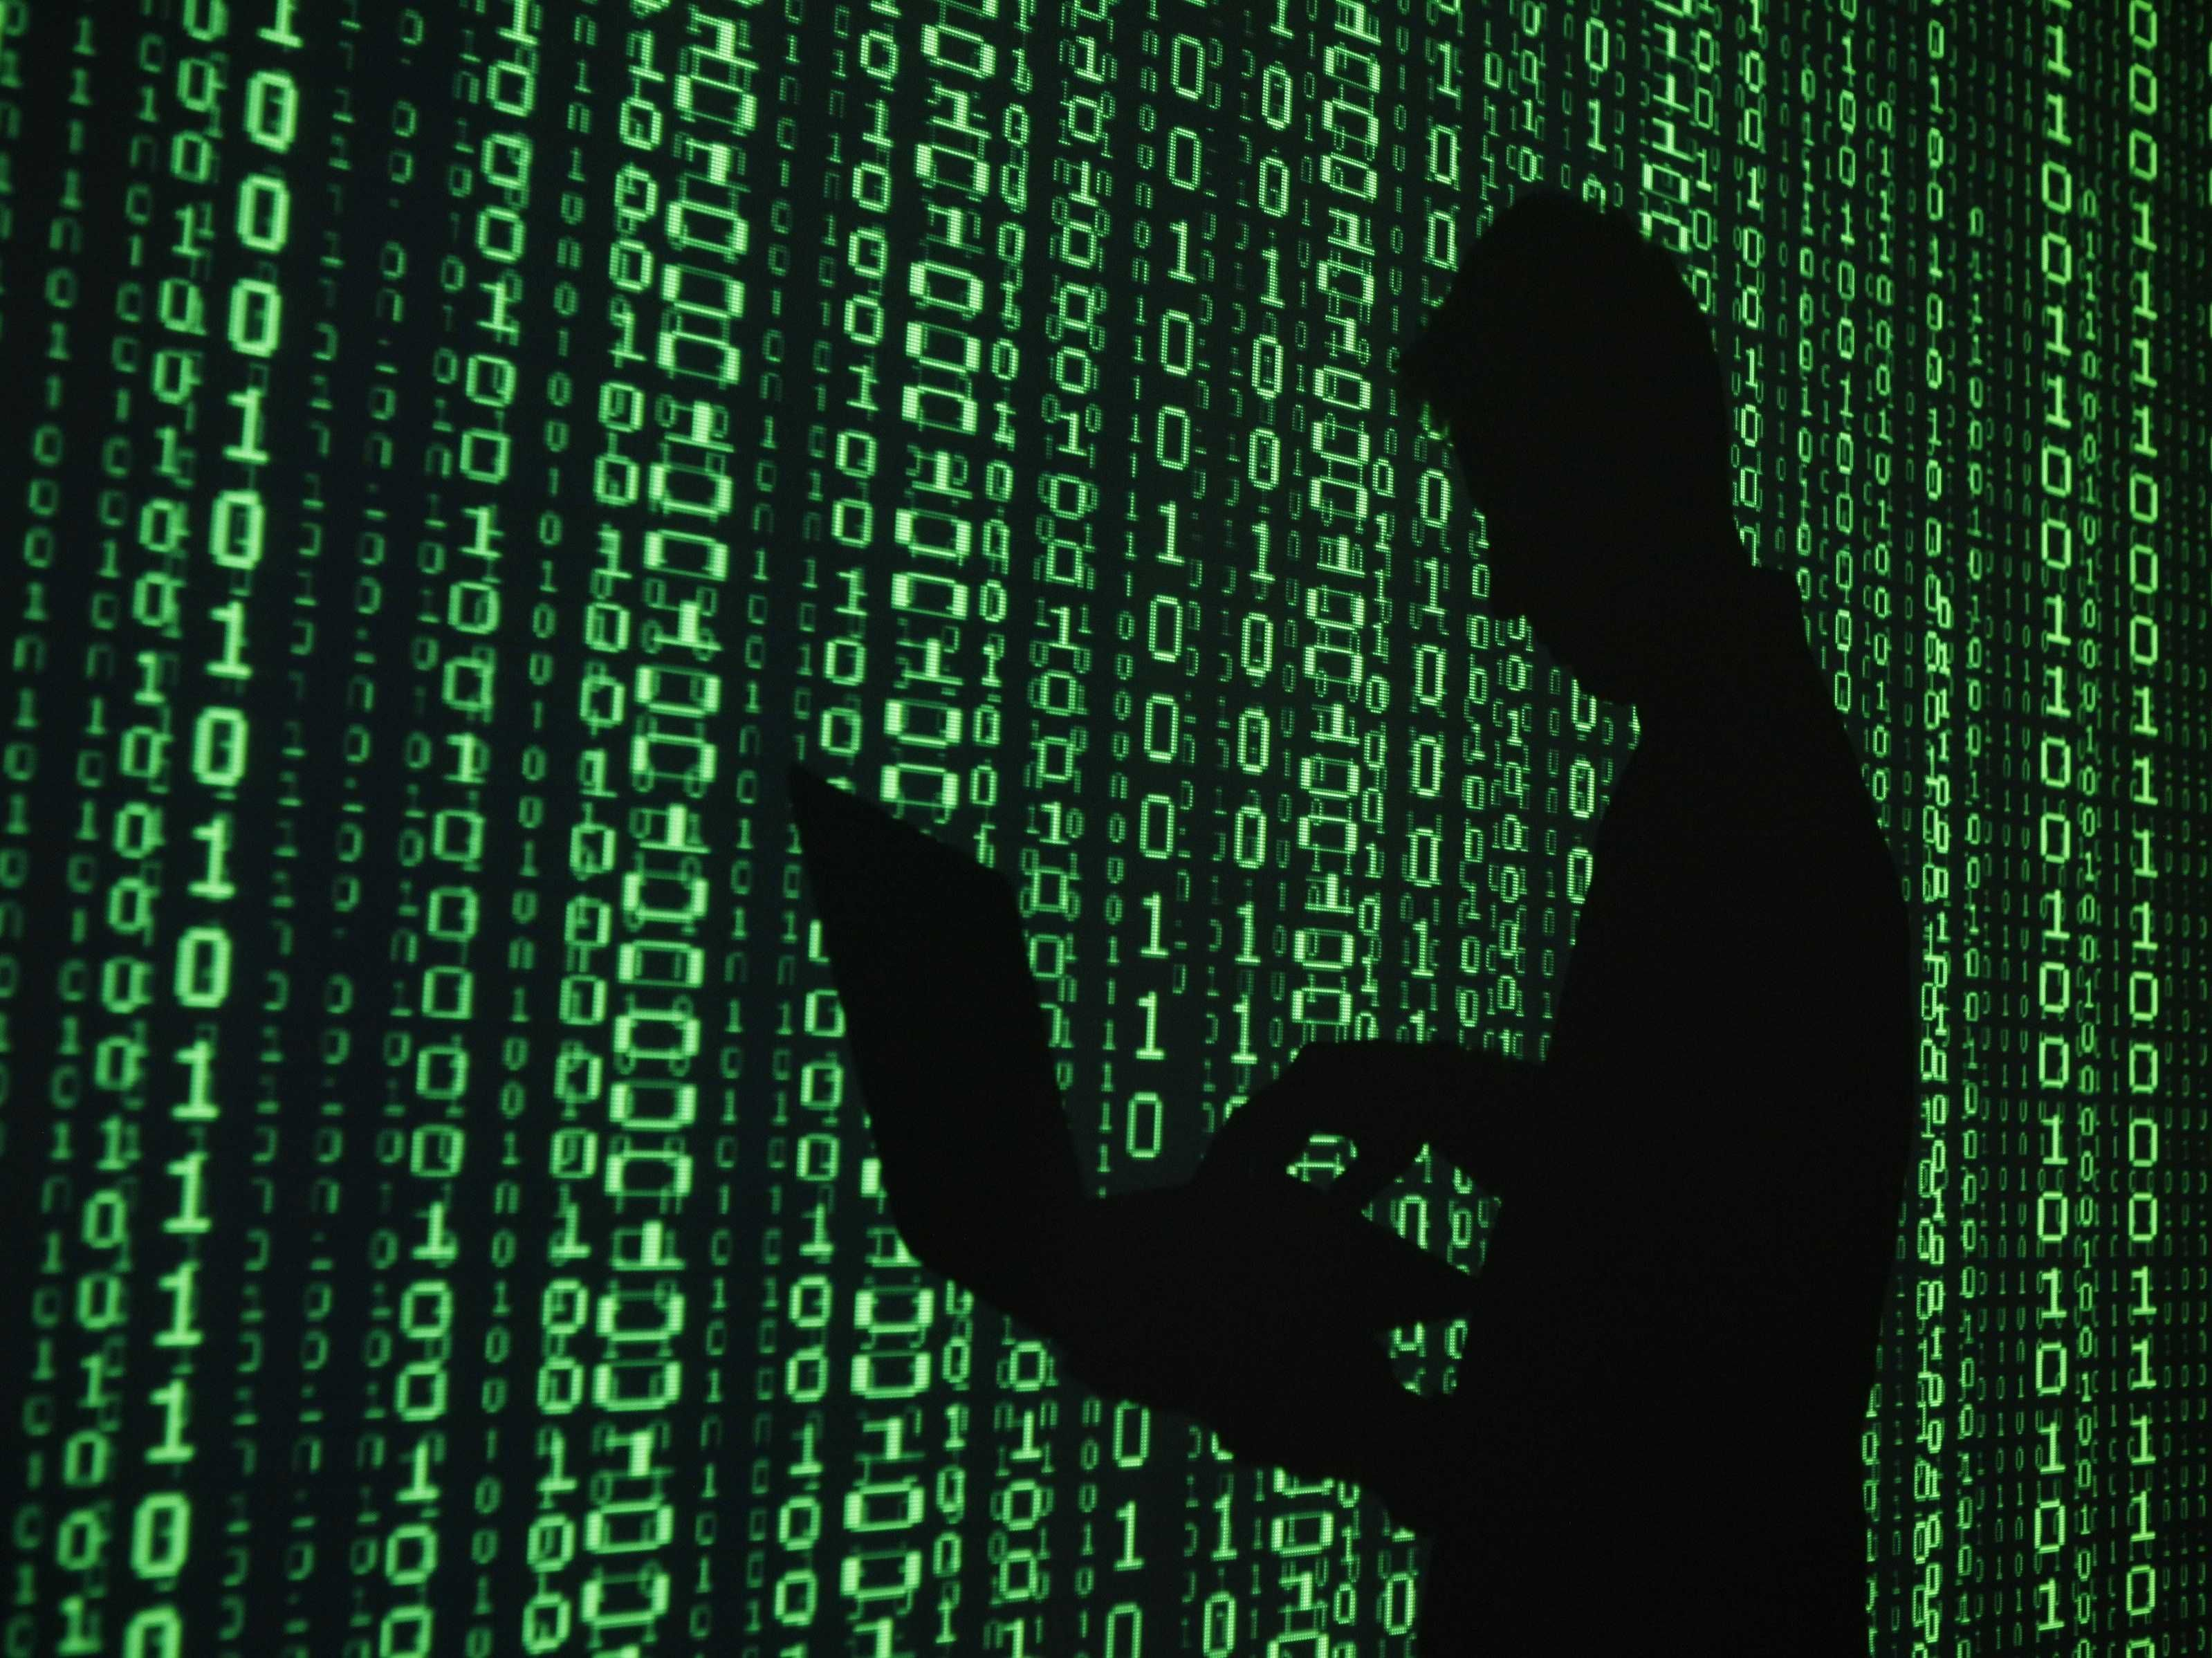 1606 - ¿Cuanto sabes de programación?